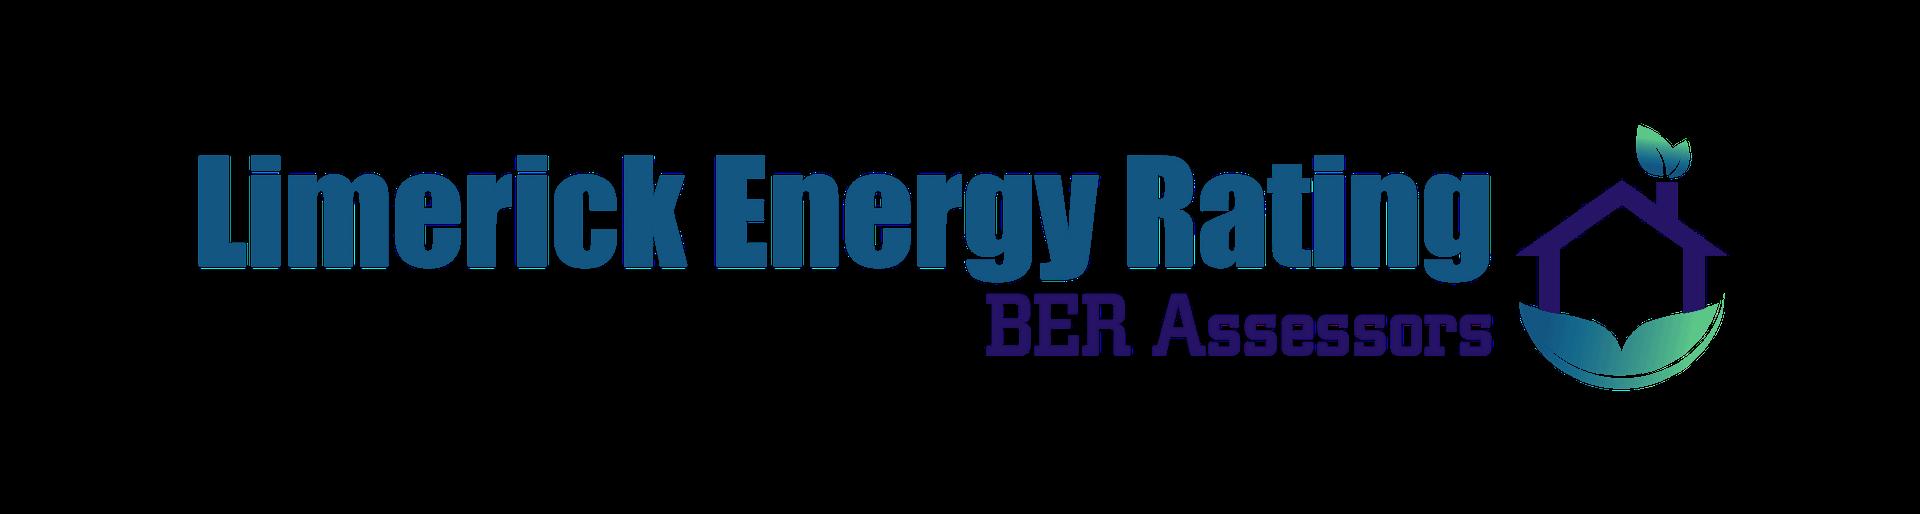 Limerick Energy Rating